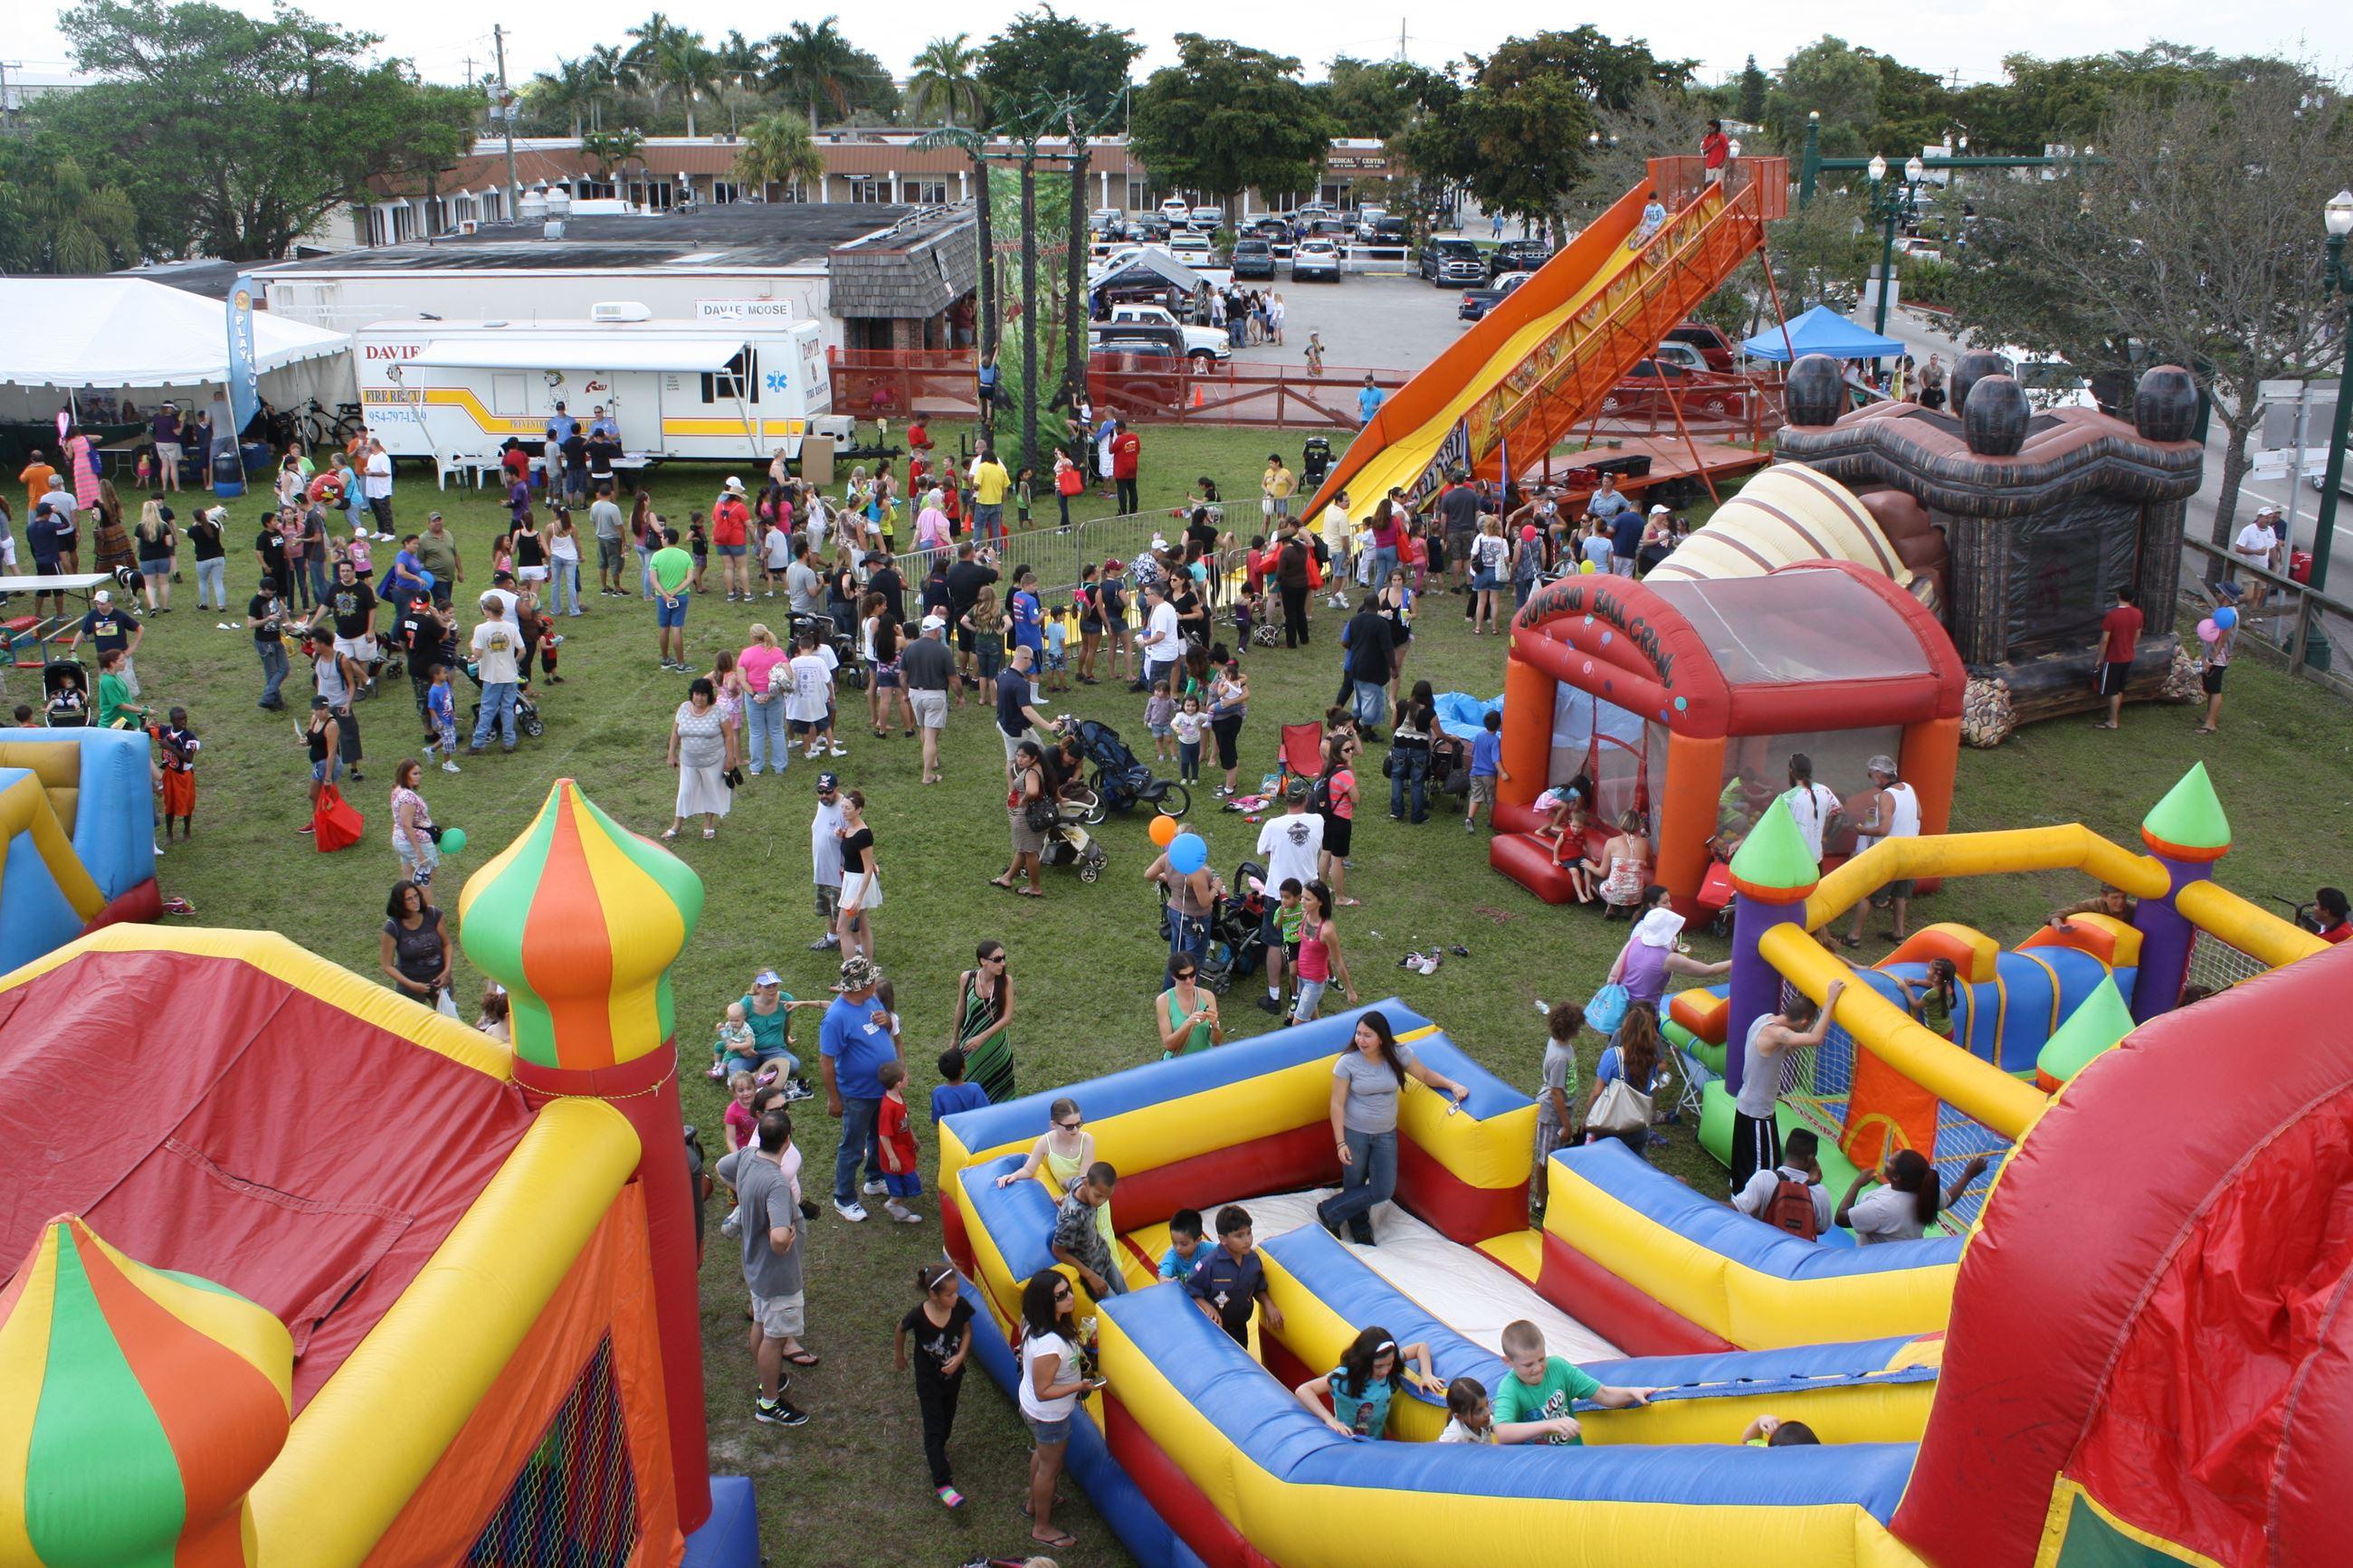 Slides and games at Orange Blossom Festival